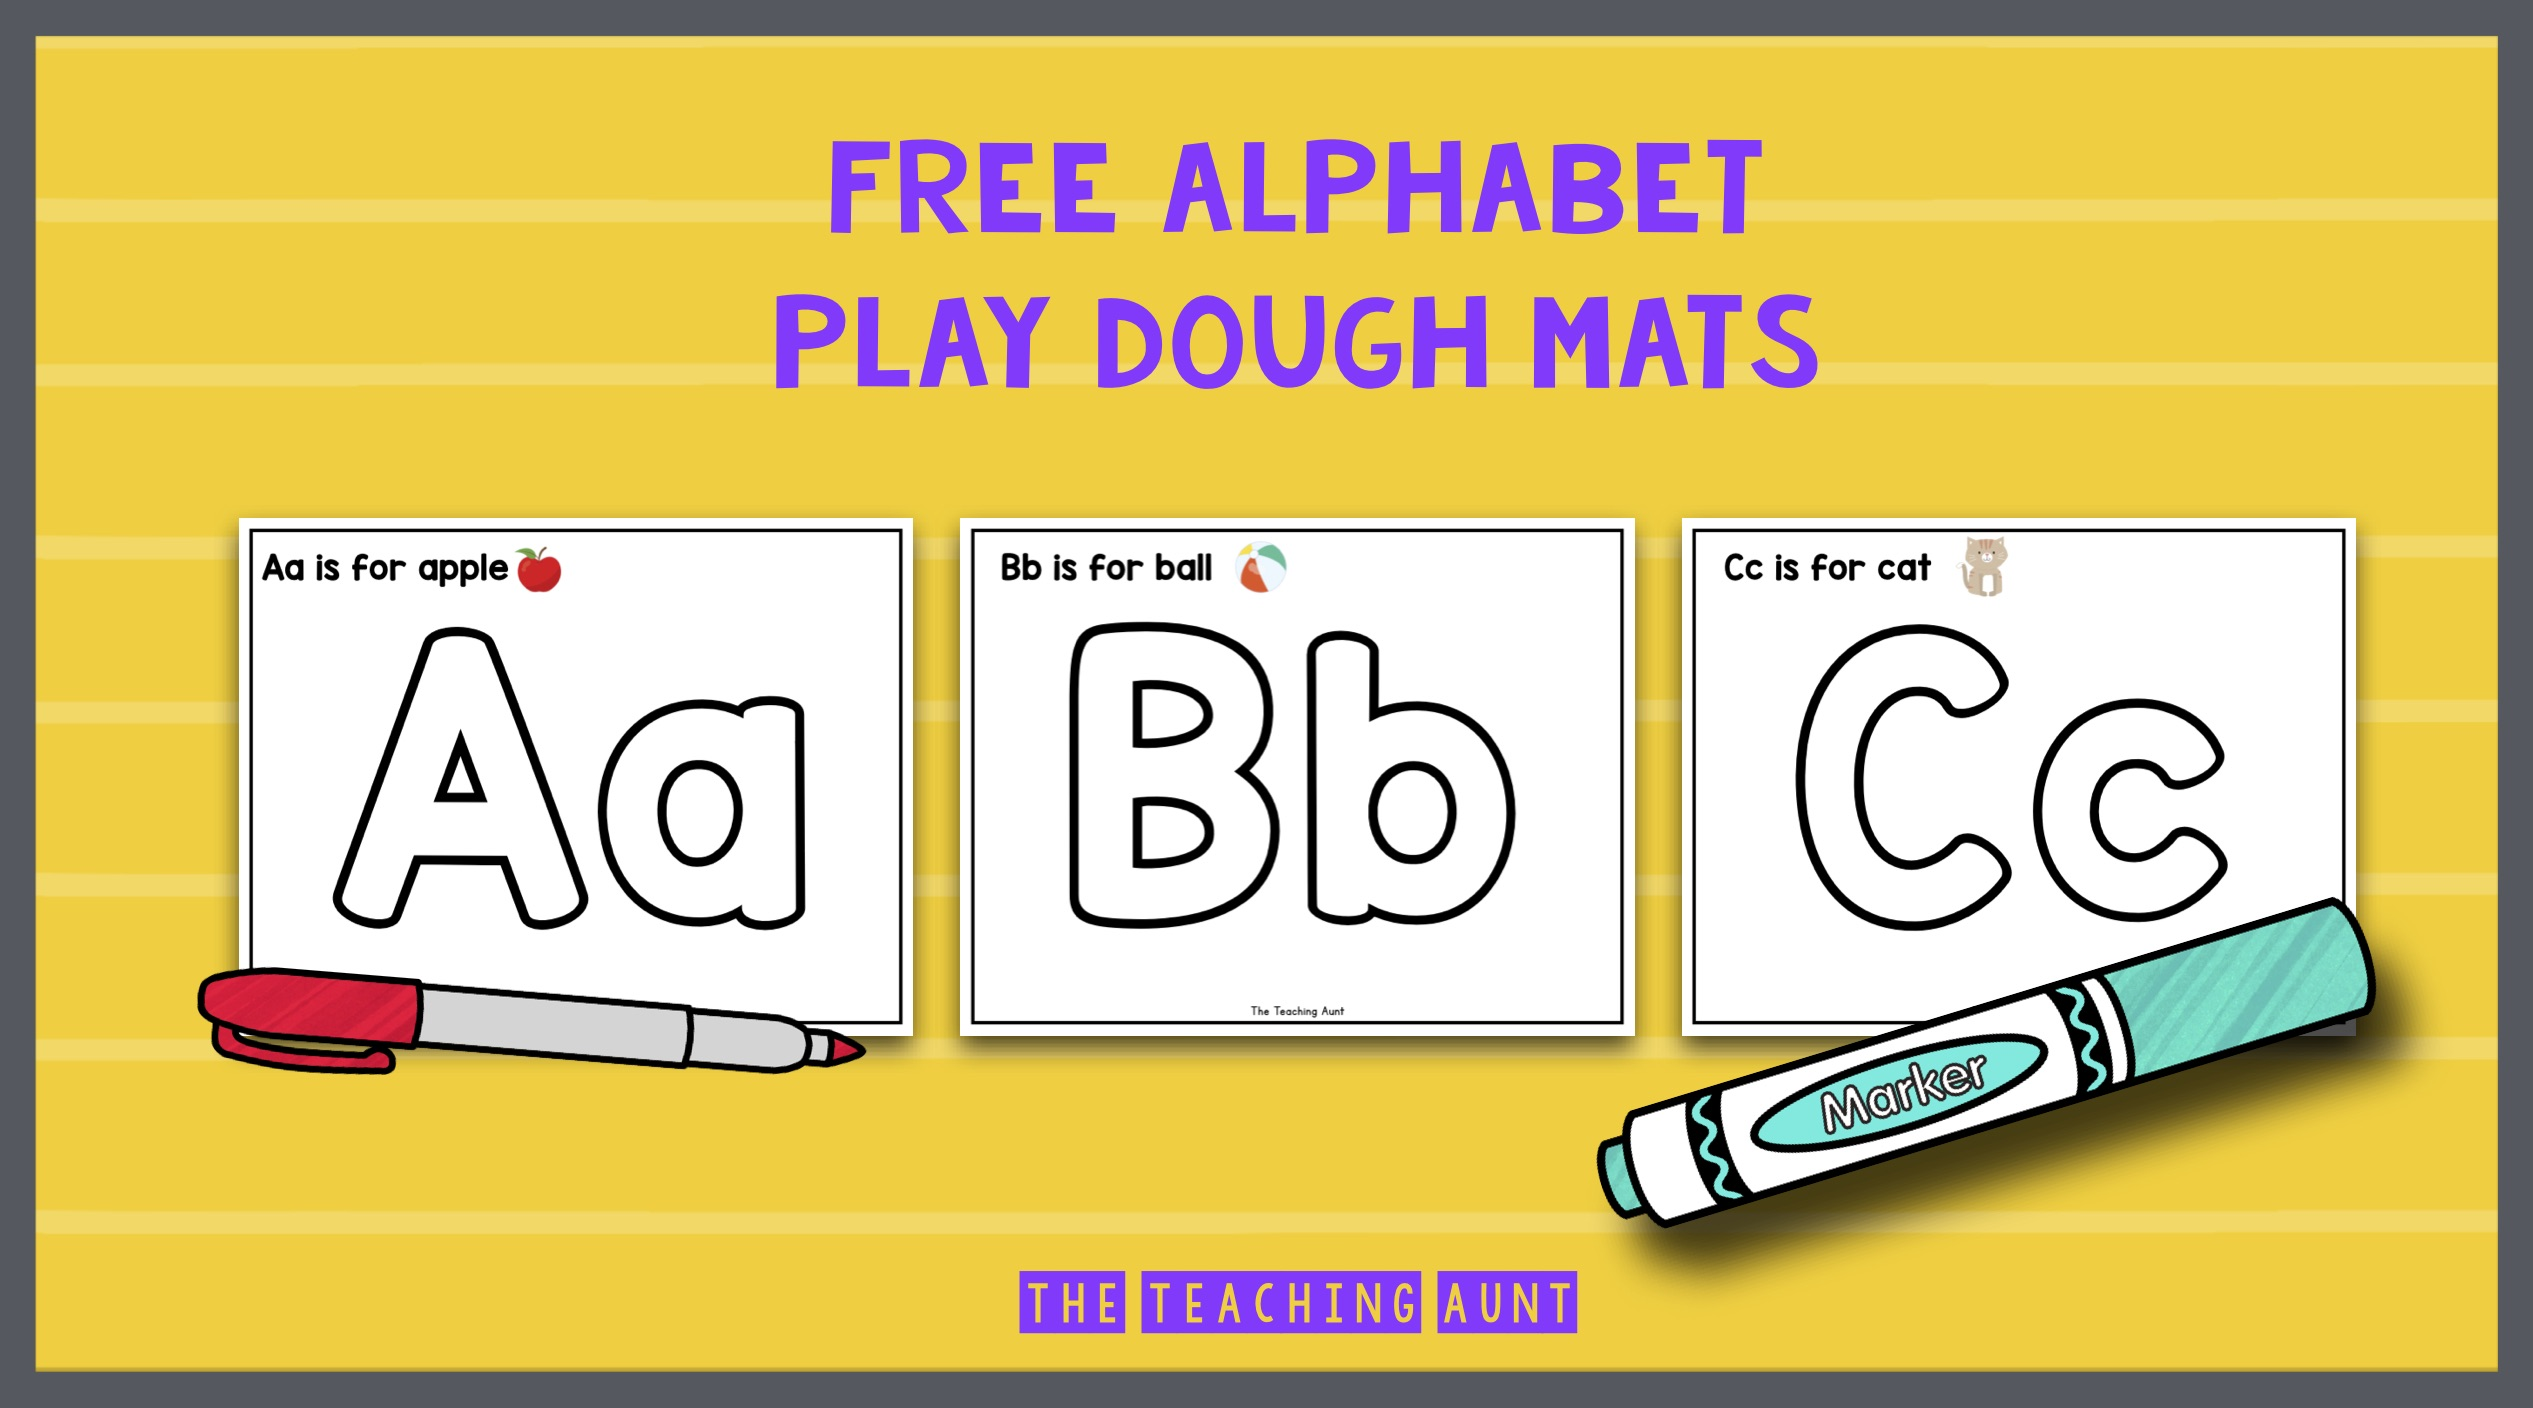 Free Alphabet Playdough Mats